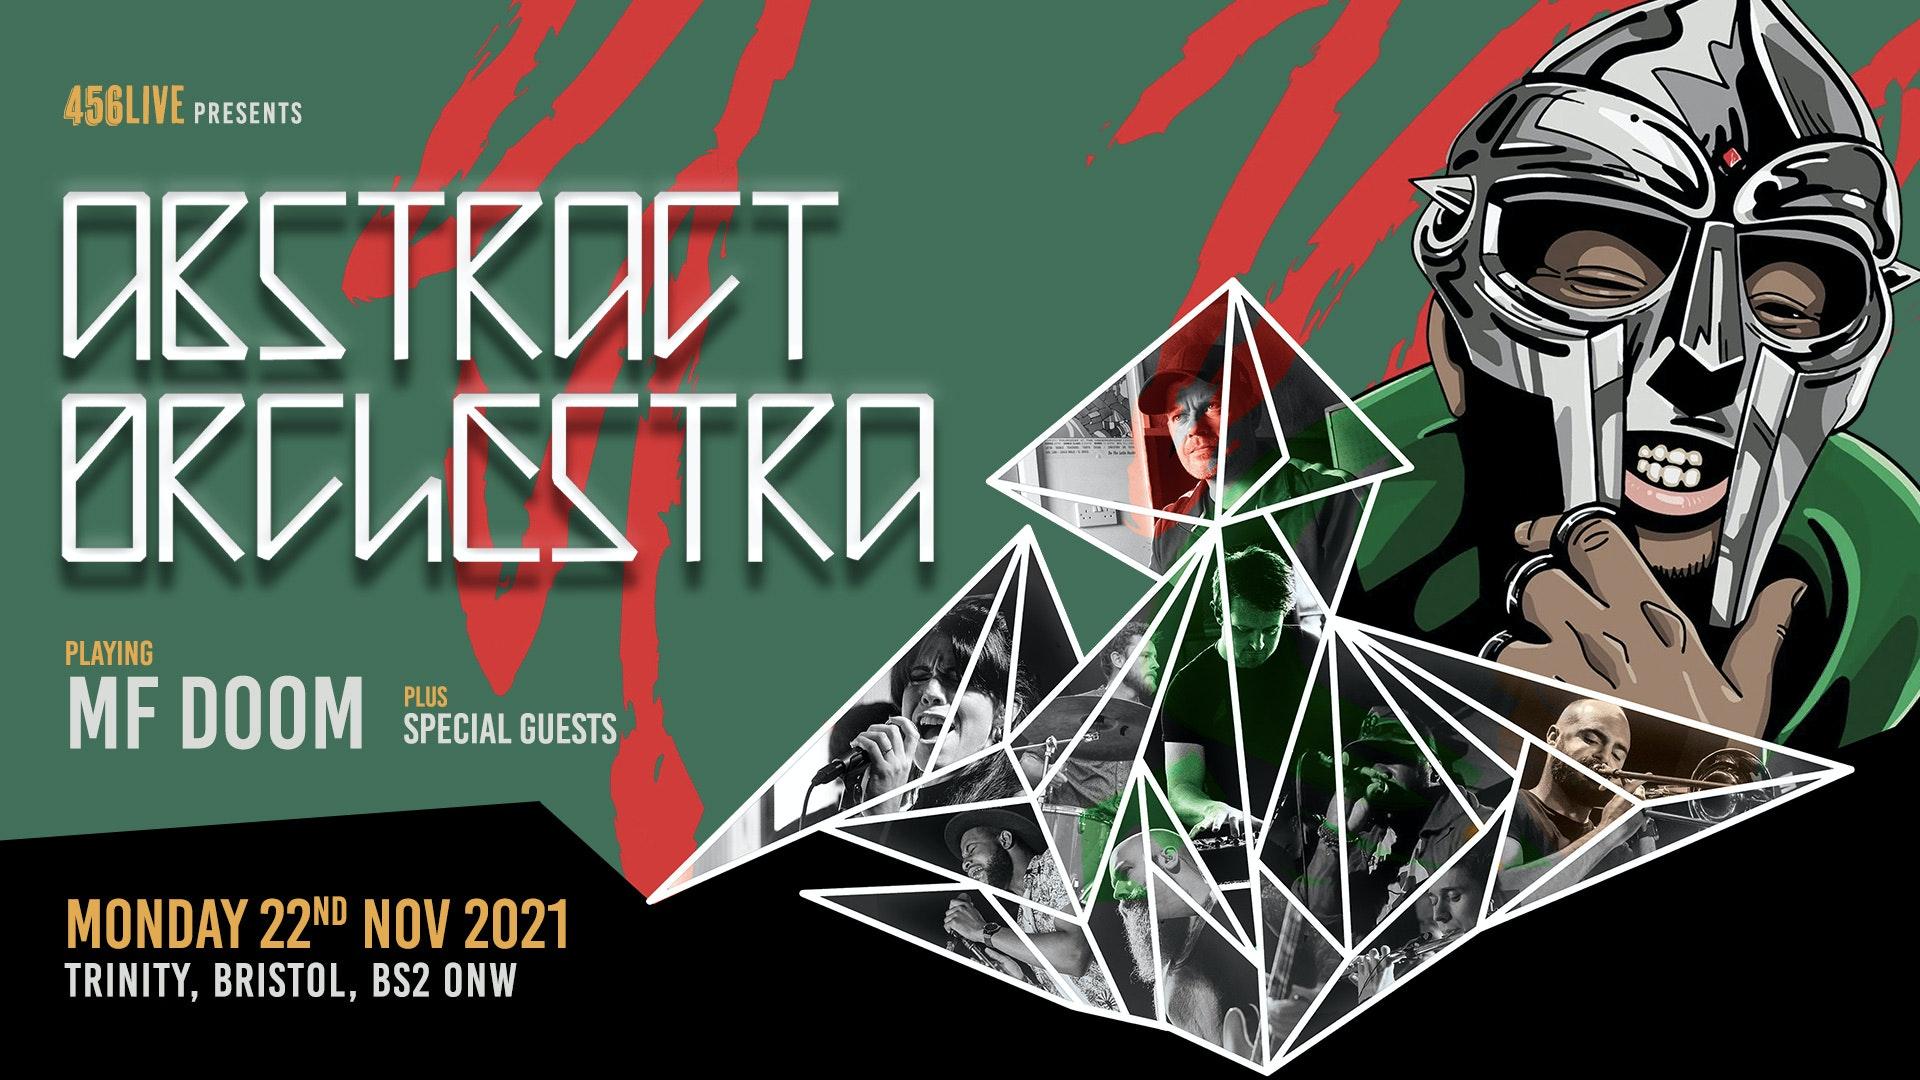 Abstract Orchestra play MF Doom